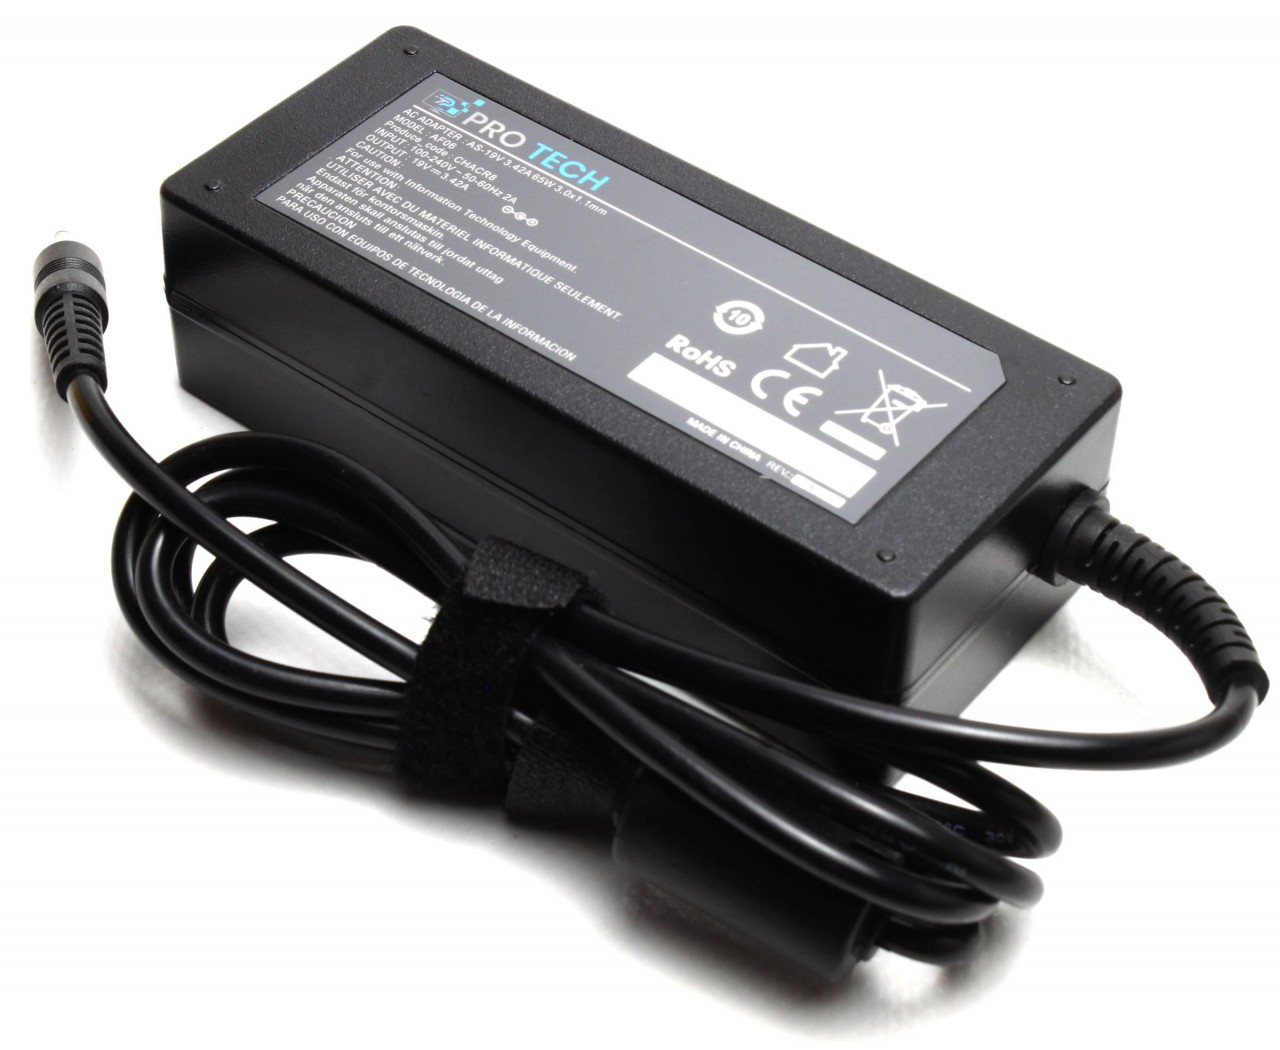 Incarcator Acer Aspire SW7 272 65W Replacement imagine powerlaptop.ro 2021